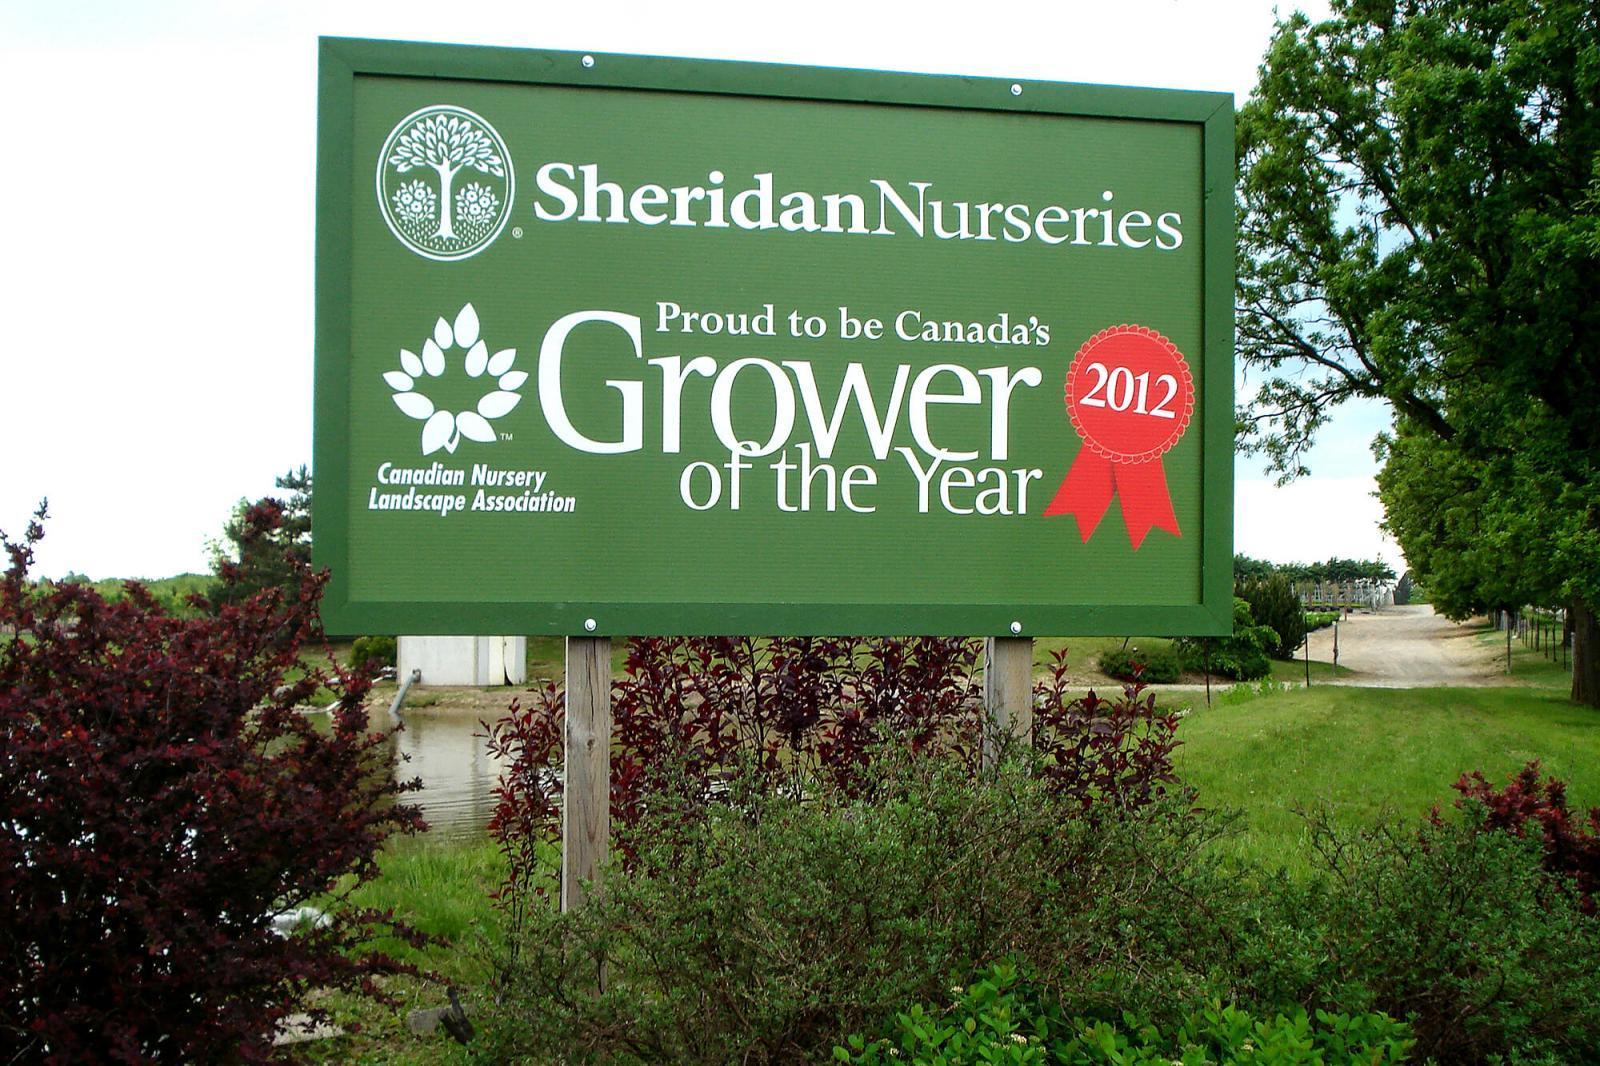 Sheridan leverages its award